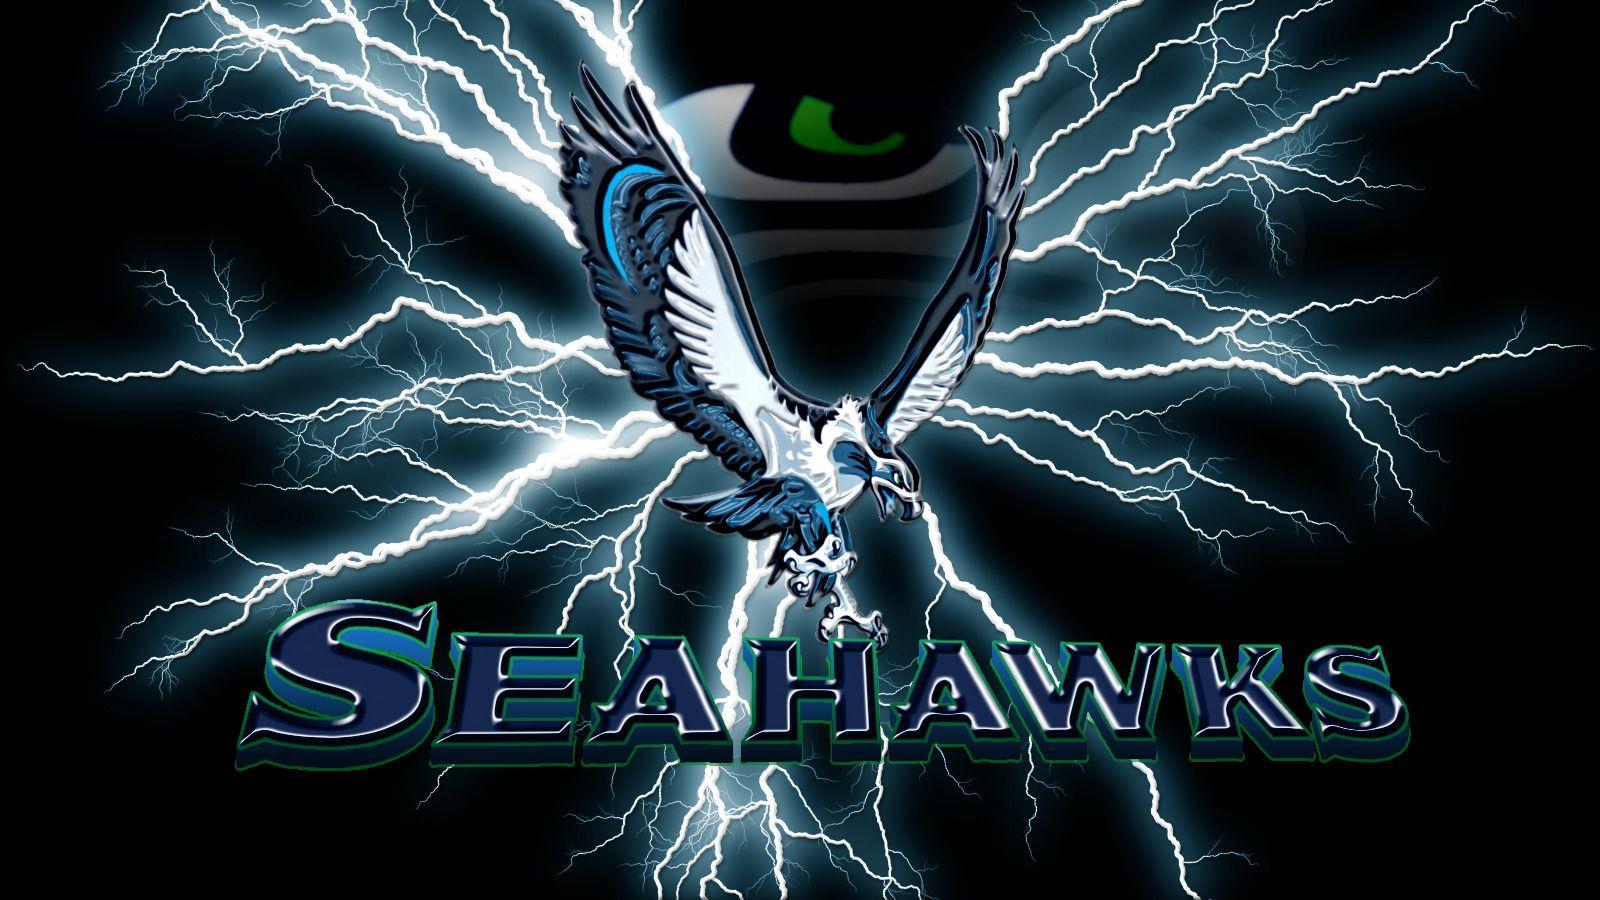 Seattle Seahawks 12th Man Legion Of Boom Beast Mode Seahawks